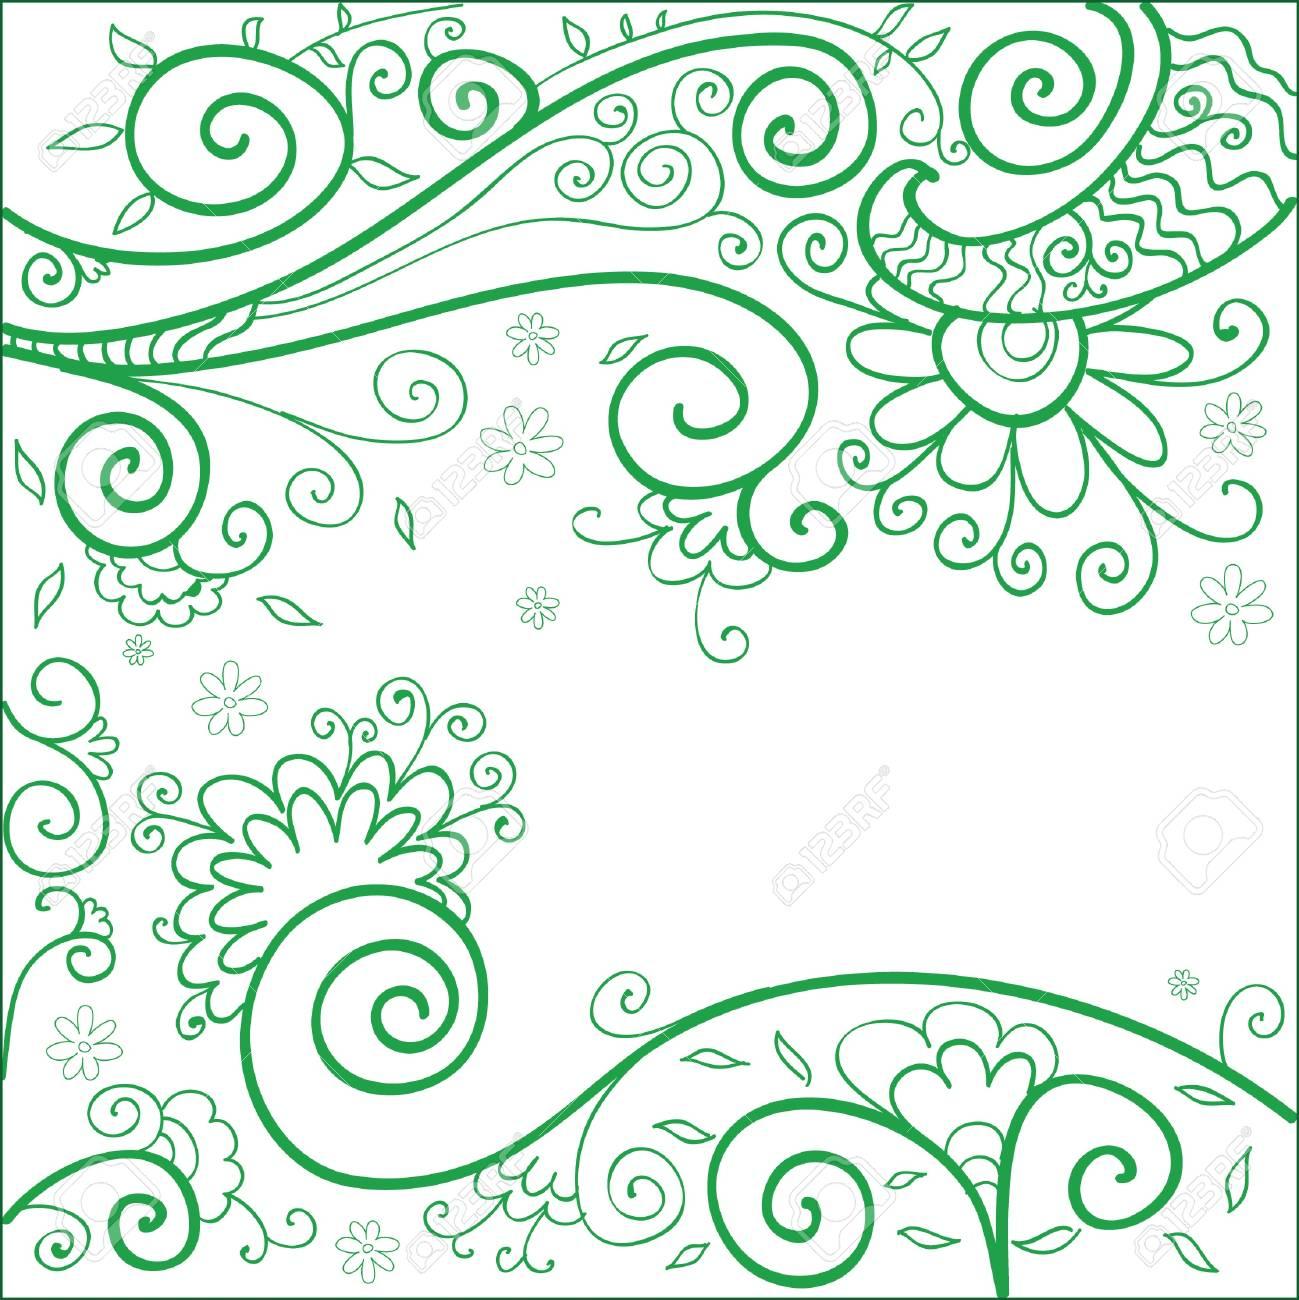 Vector handdrown  illustration of floral background Stock Vector - 14327943